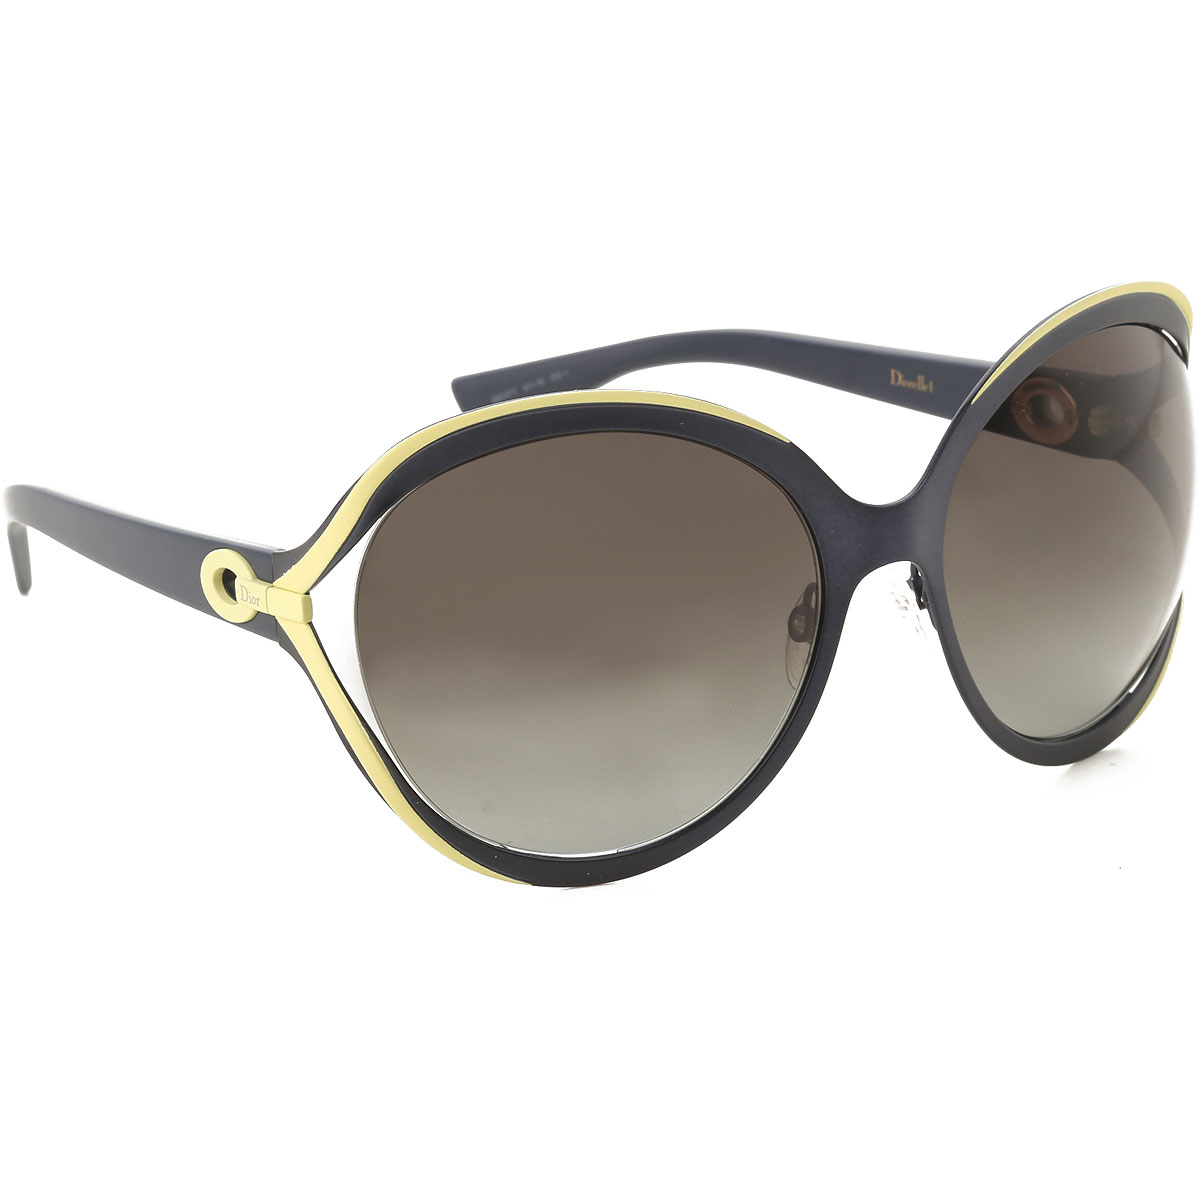 Christian Dior Sunglasses On Sale, Blue, 2019